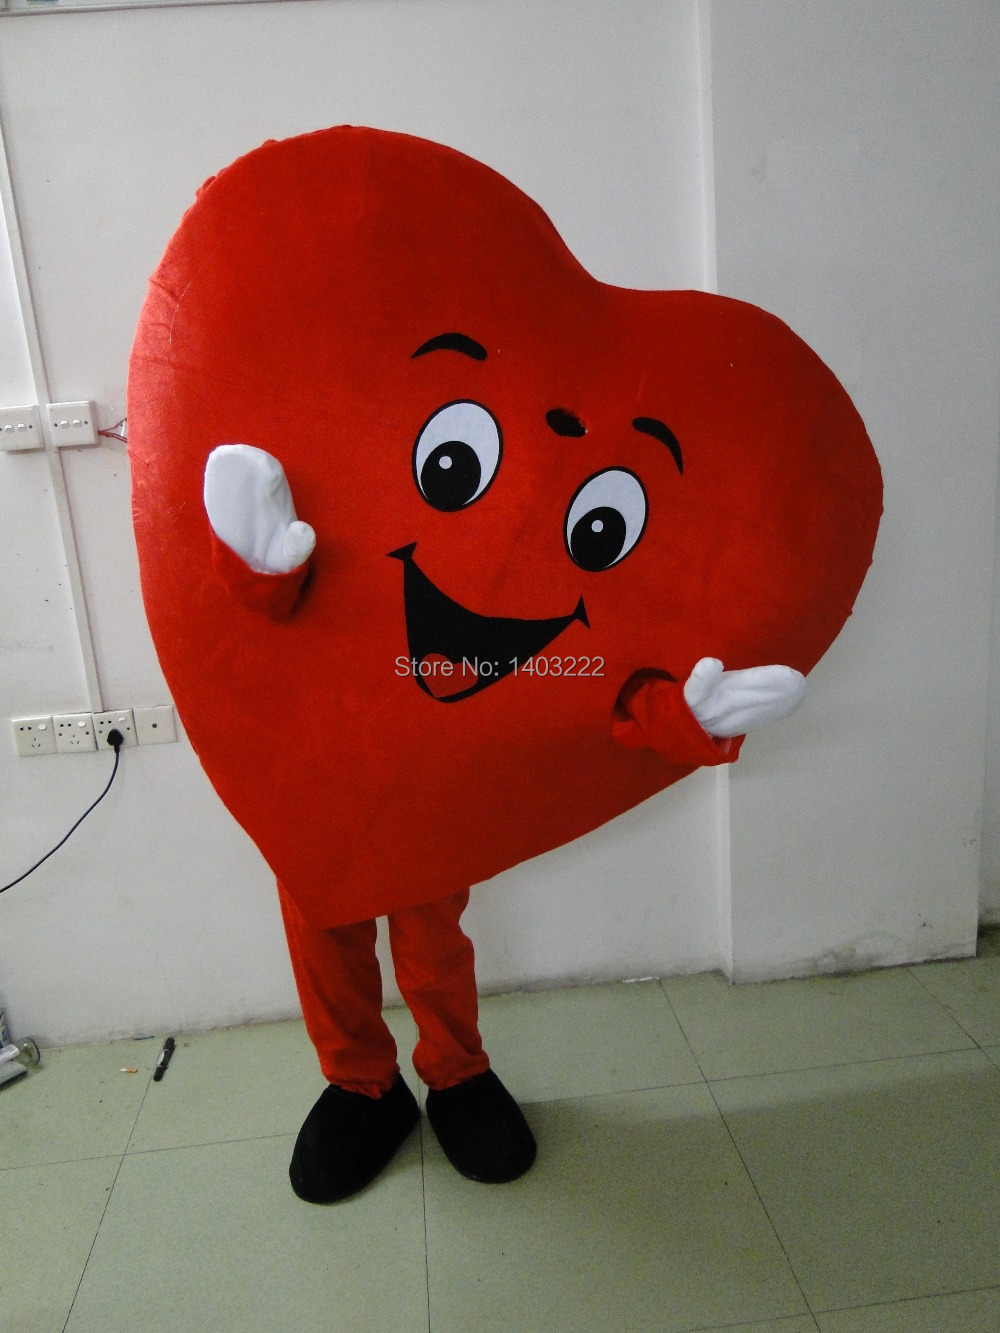 High quality Adult Mascot Costume Adult Size Fancy Heart Mascot Costume free shipping